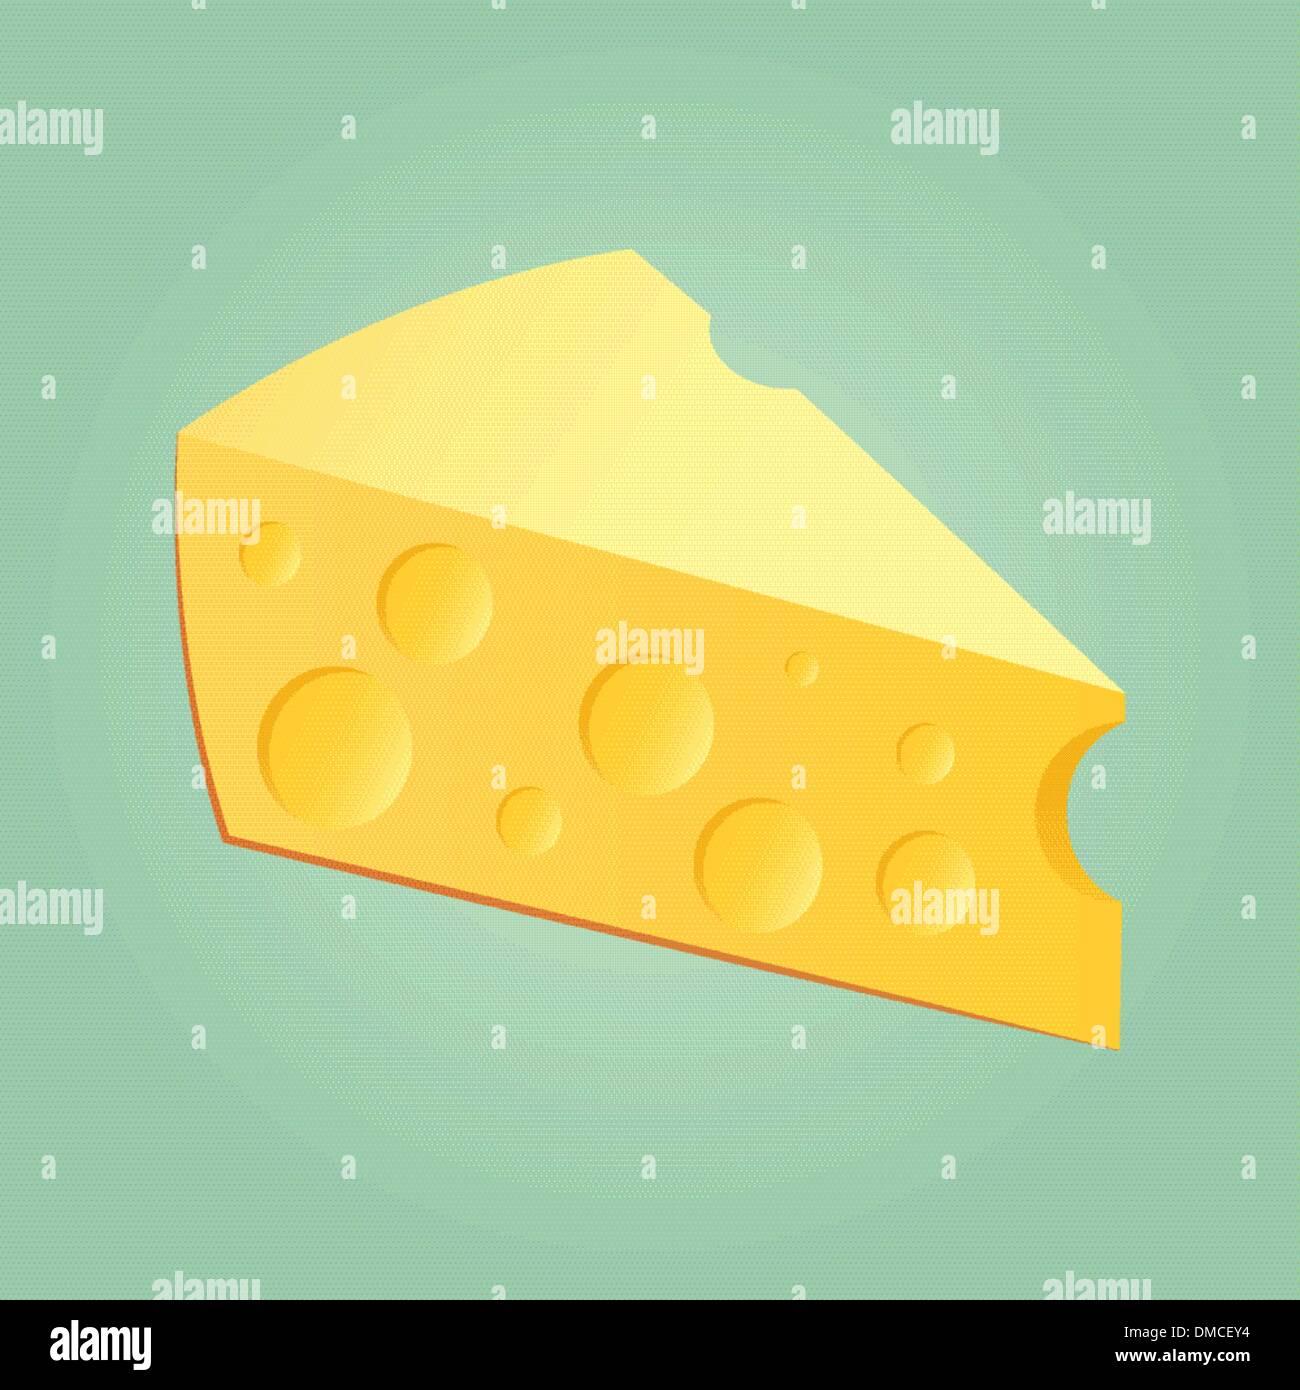 Platte aus Käse Stock Vektor